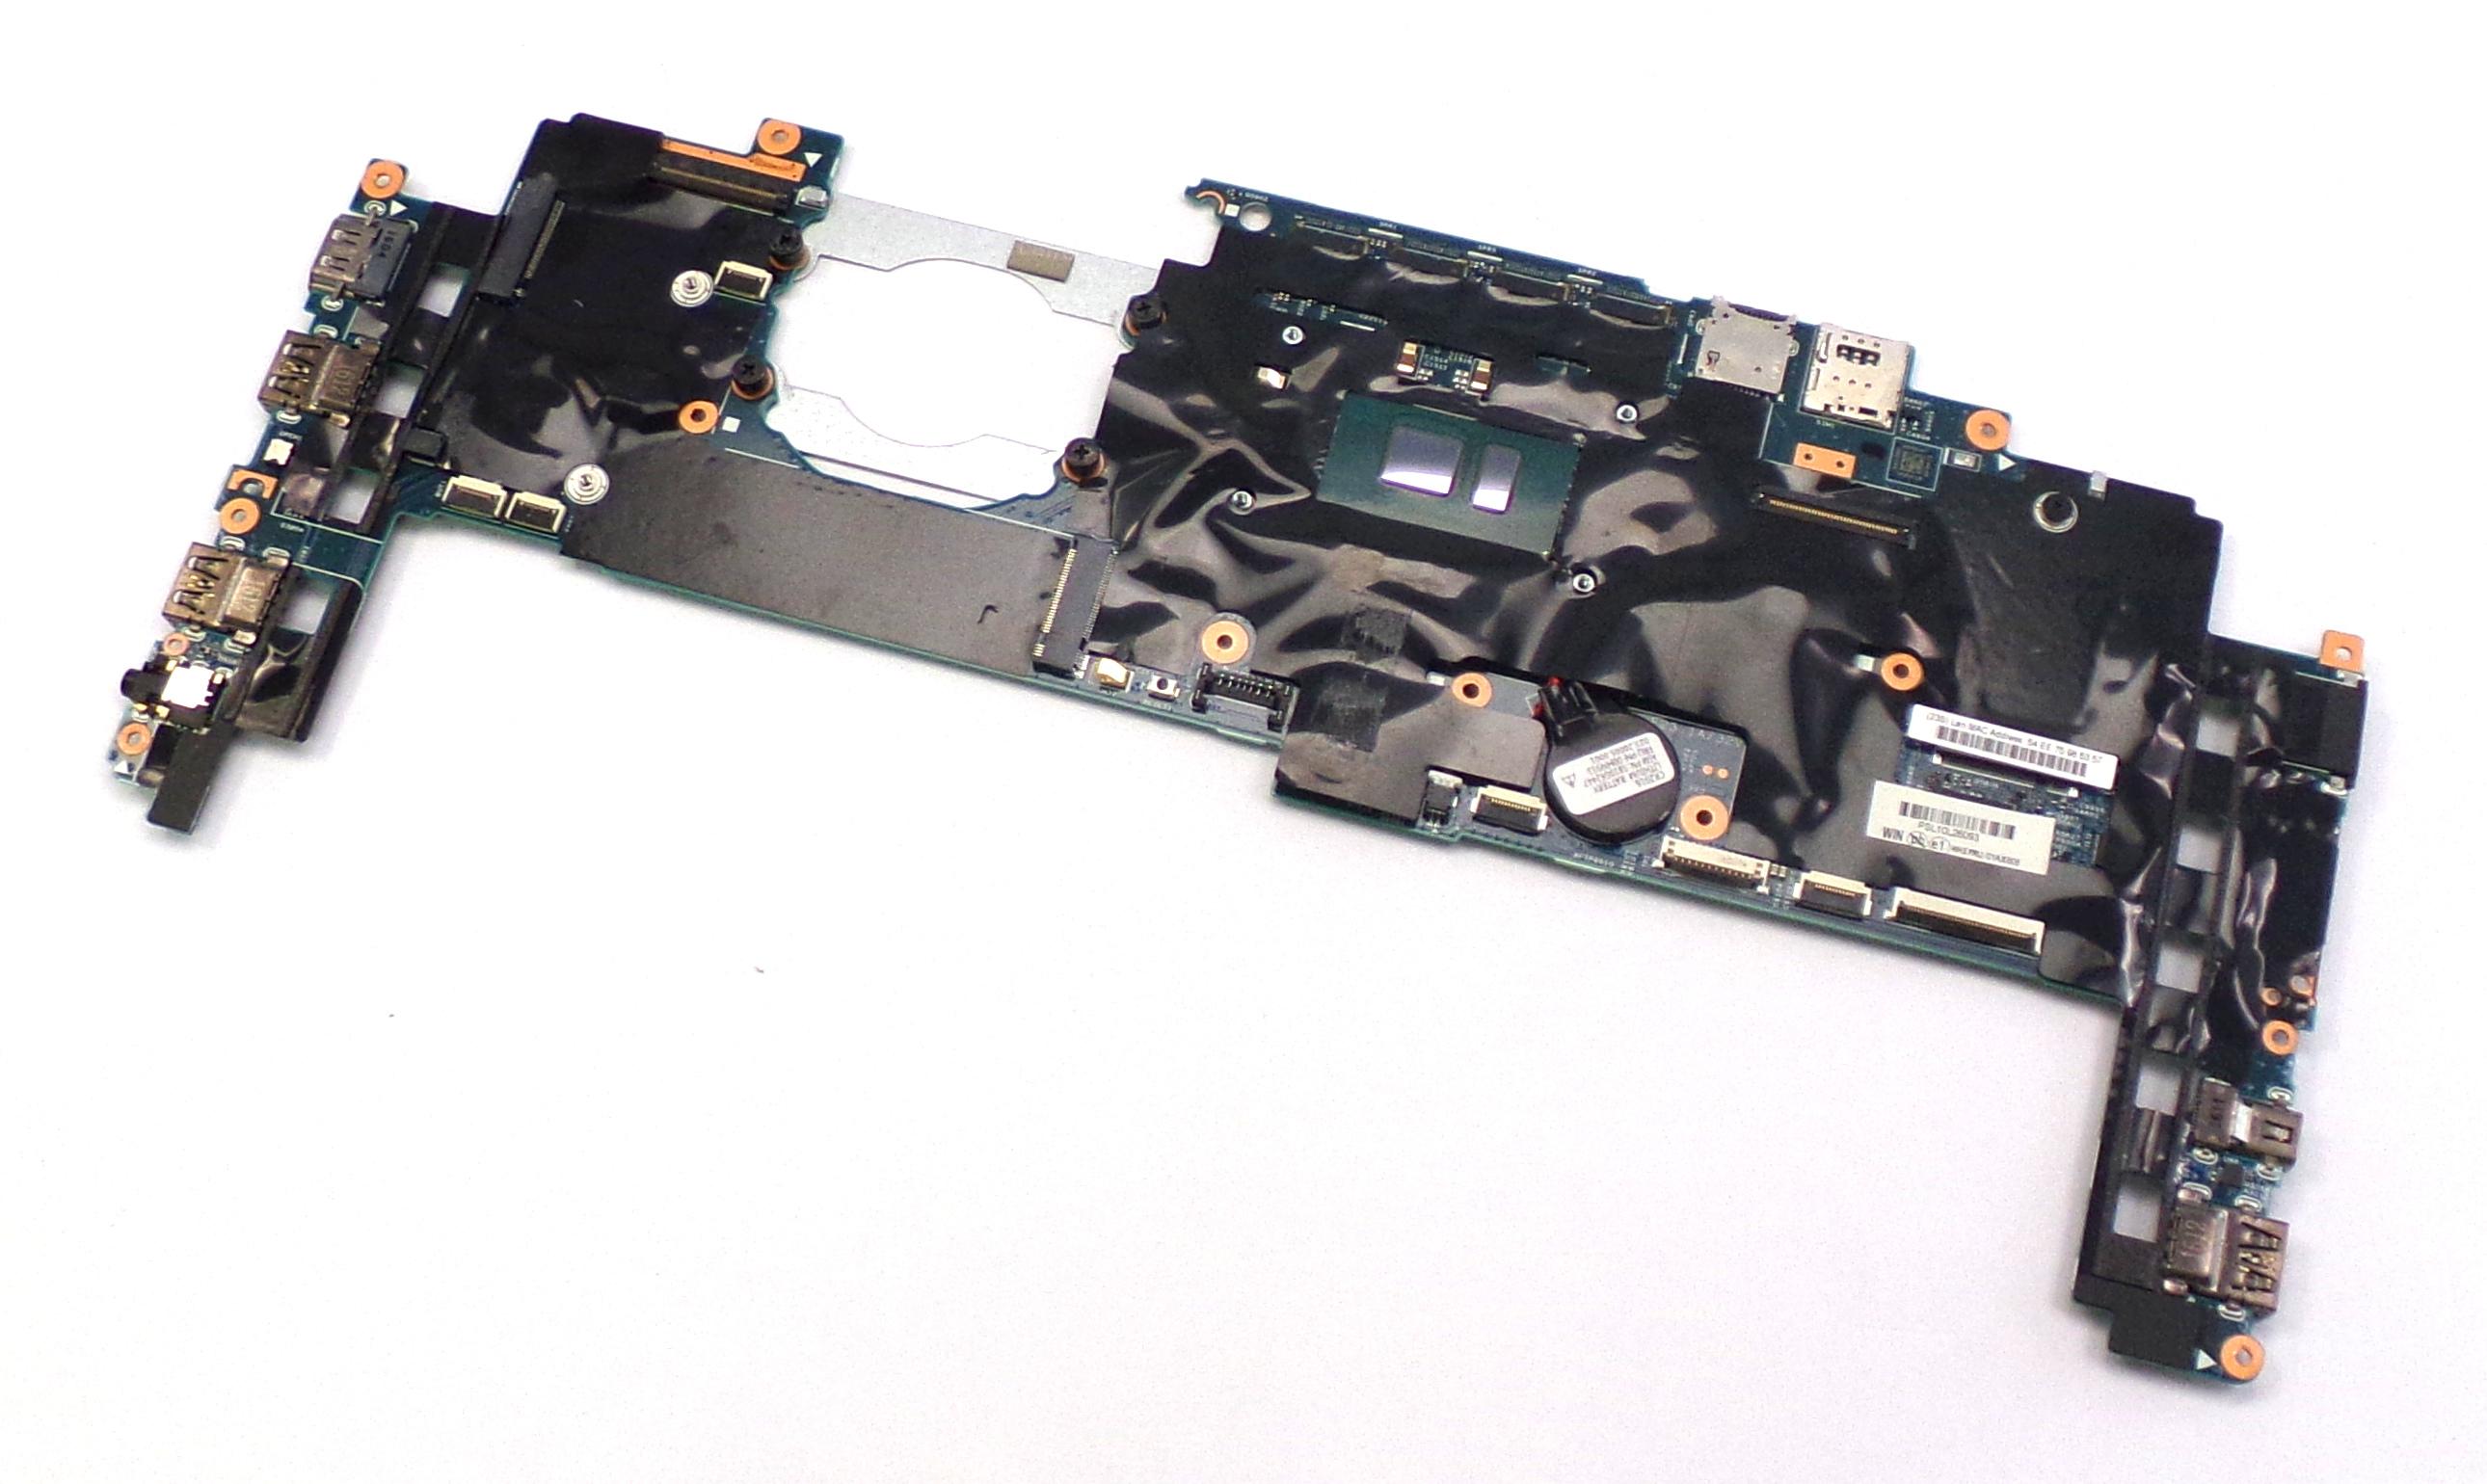 Lenovo 01AX808 ThinkPad X1 Carbon with Intel i7-6600U 2.6GHz Laptop Motherboard